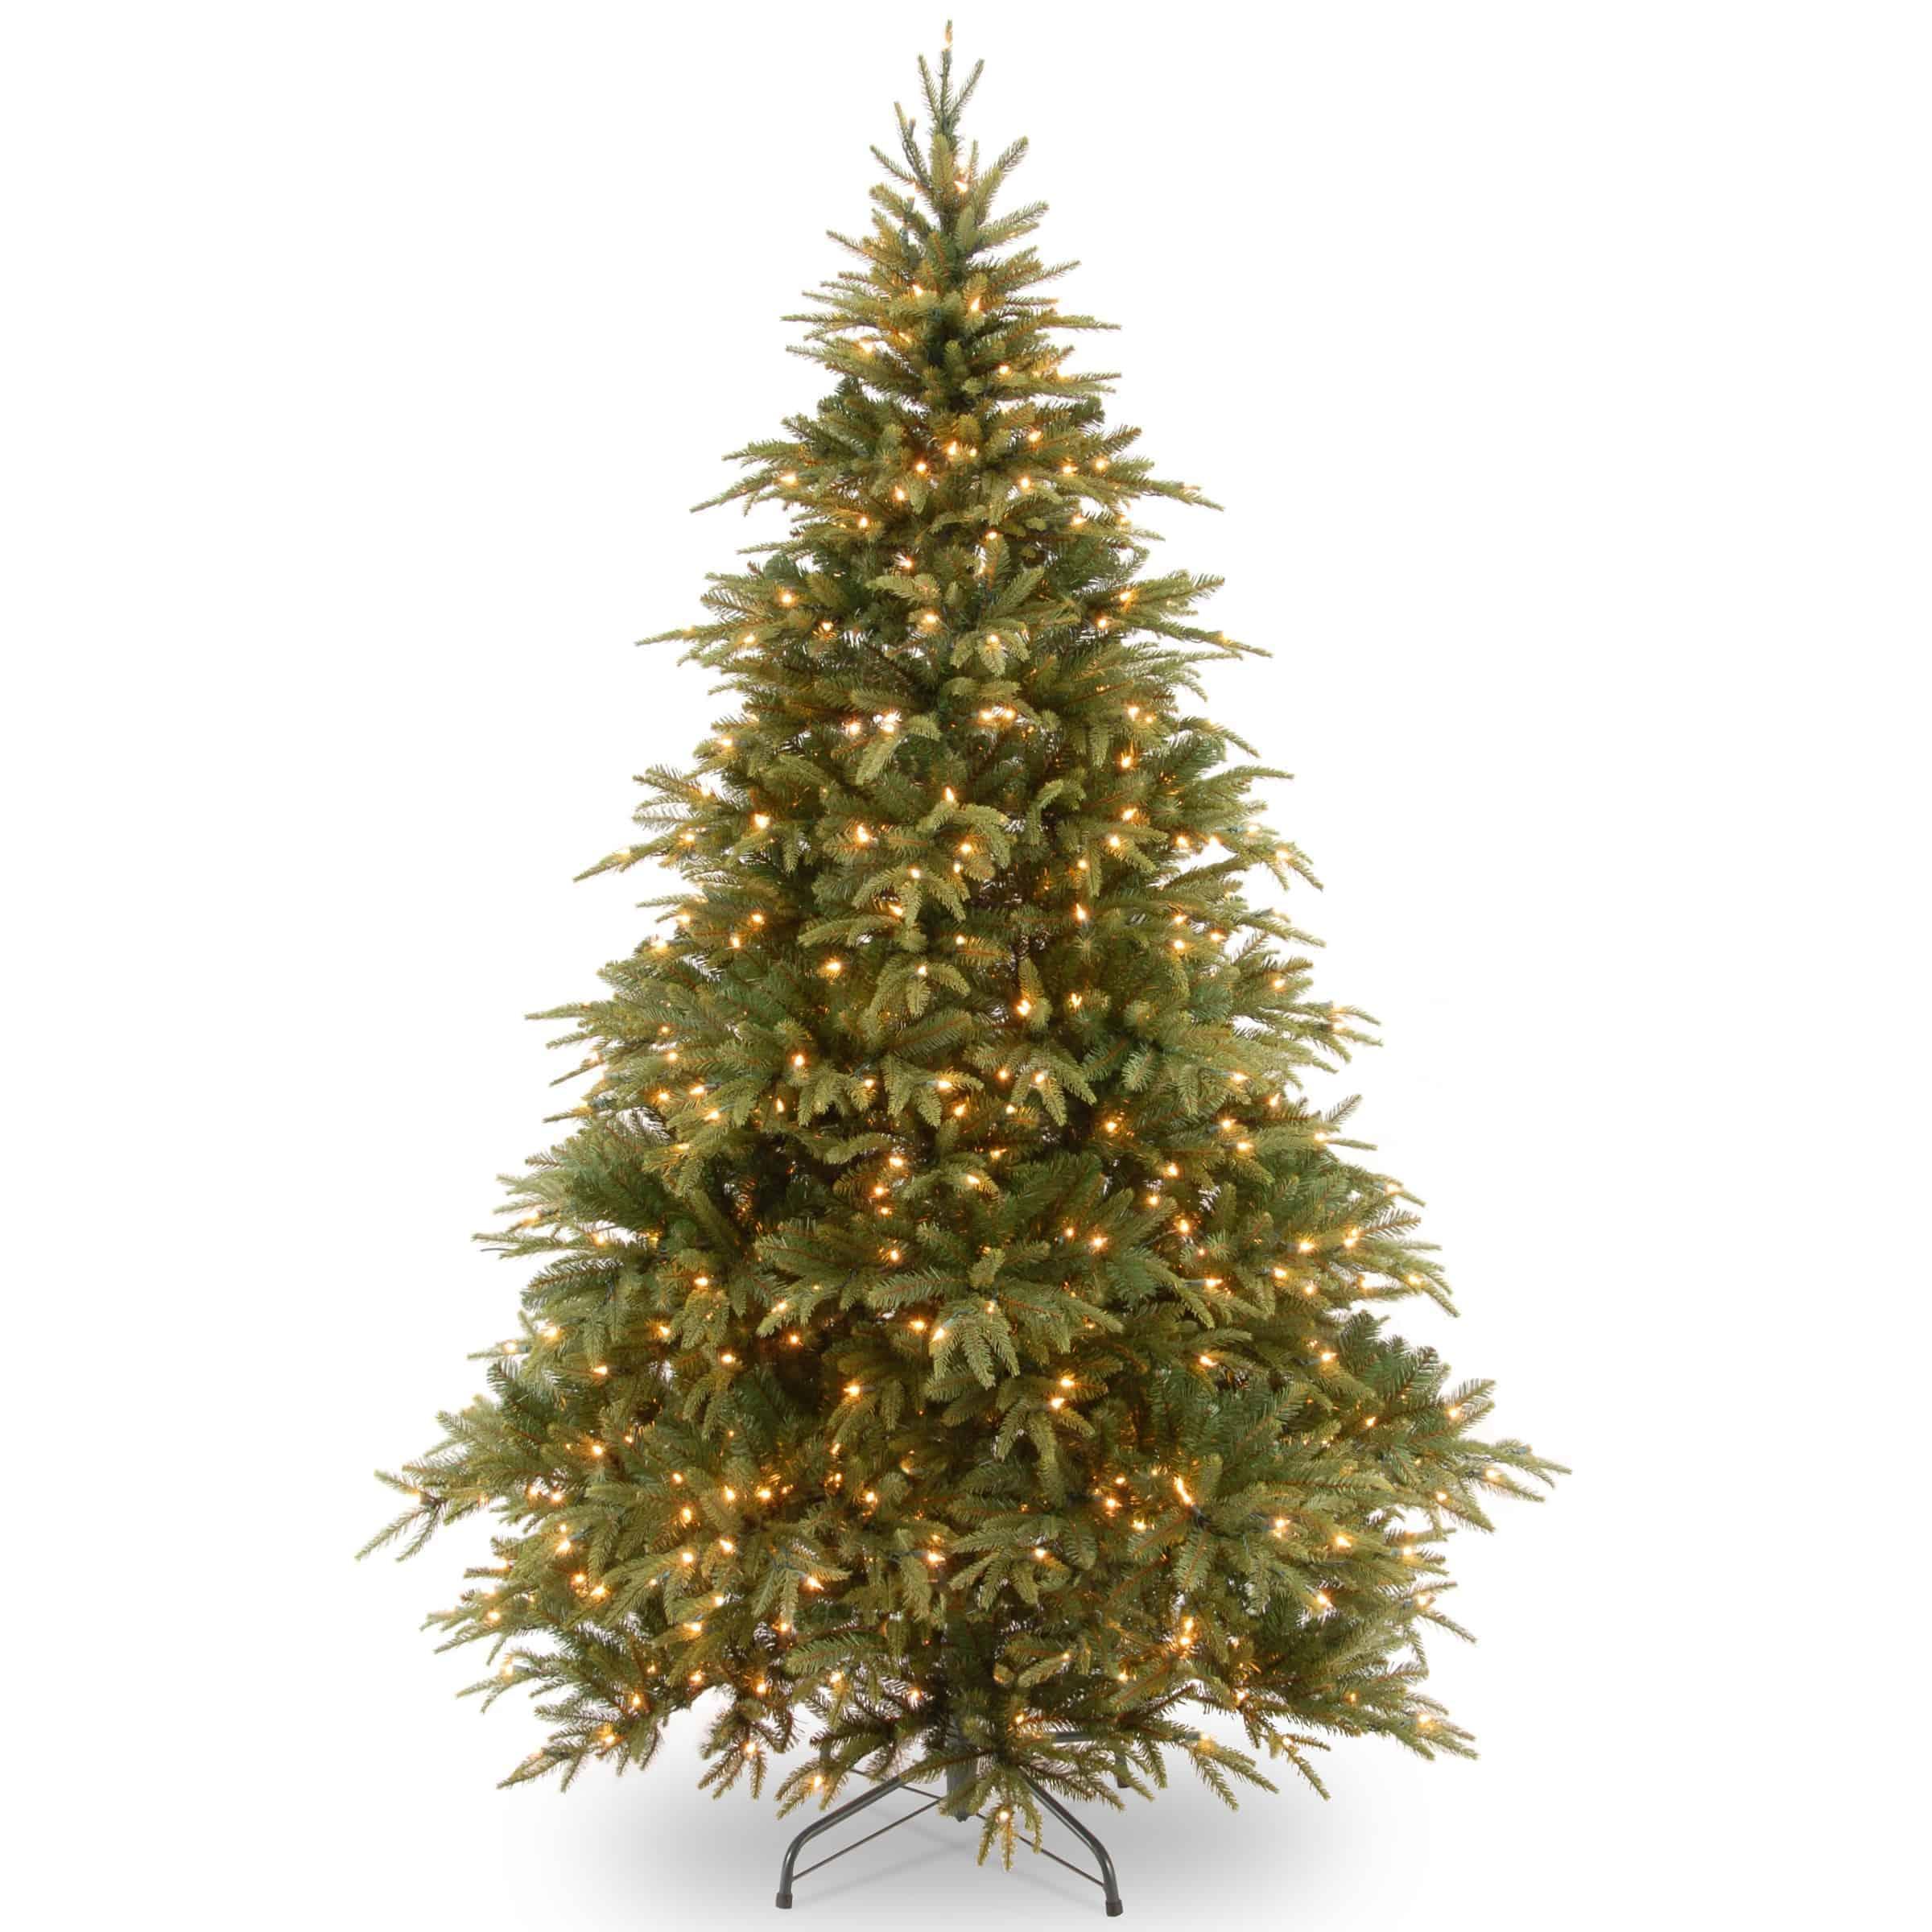 Pre Lit Christmas Tree Clearance.7 5 Ft Warrington Spruce Pre Lit Artificial Christmas Tree Online Only